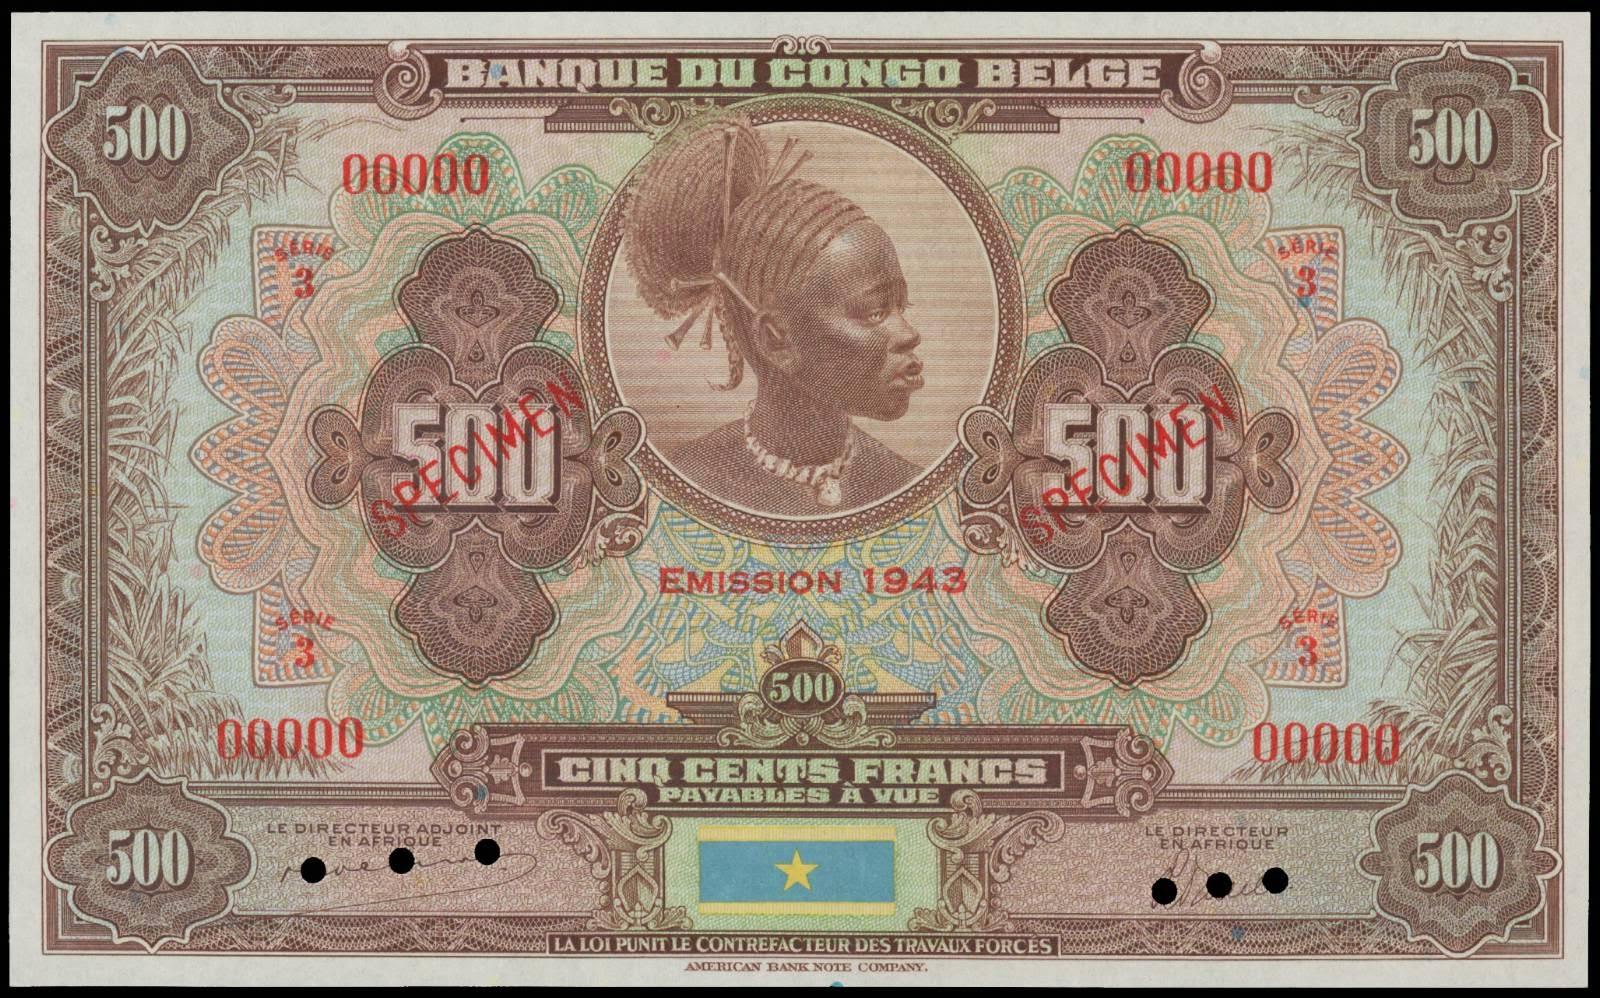 Belgian Congo 500 Francs Mangbetu woman